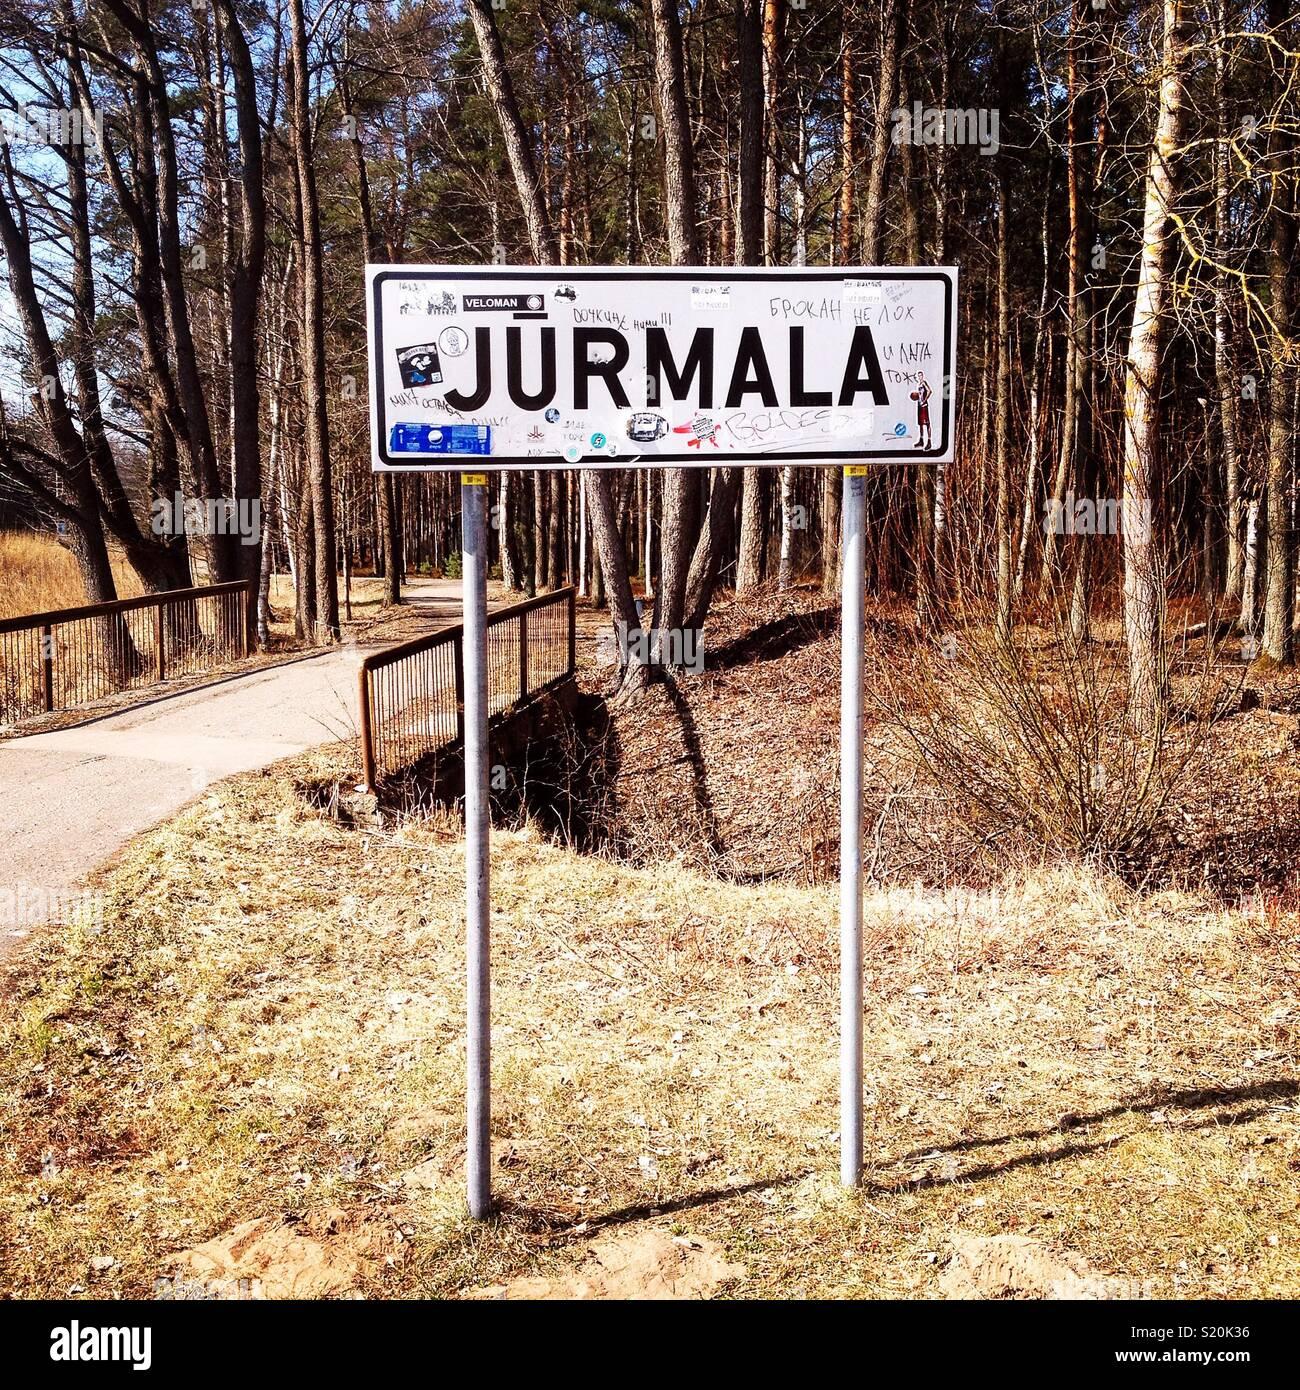 Jurmala, Latvia - Stock Image